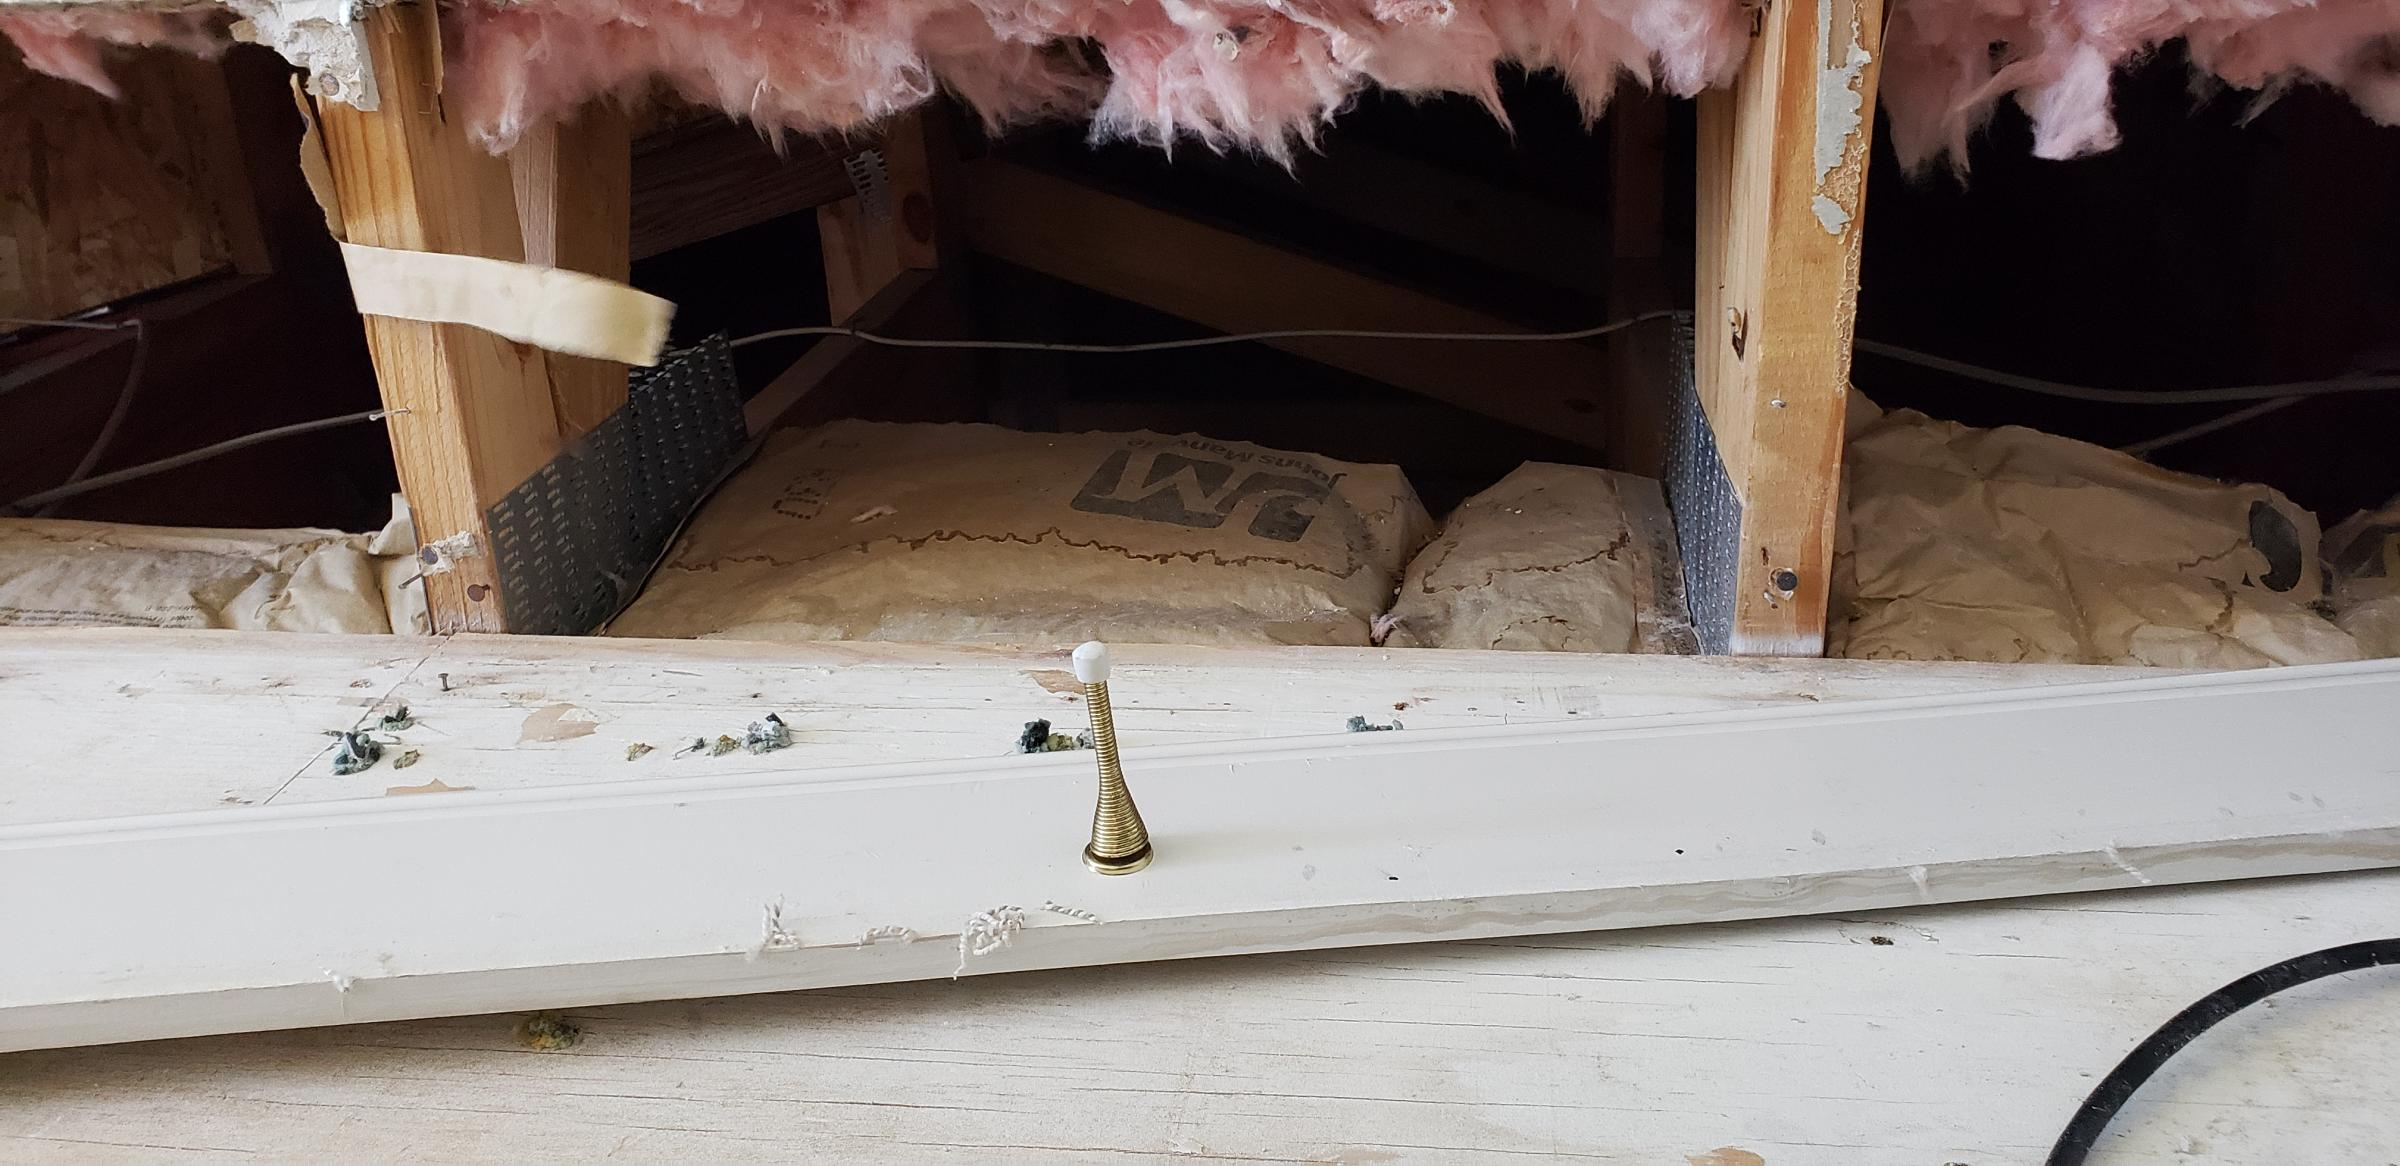 Room above Garage-20190326_124221_1553619549887.jpg